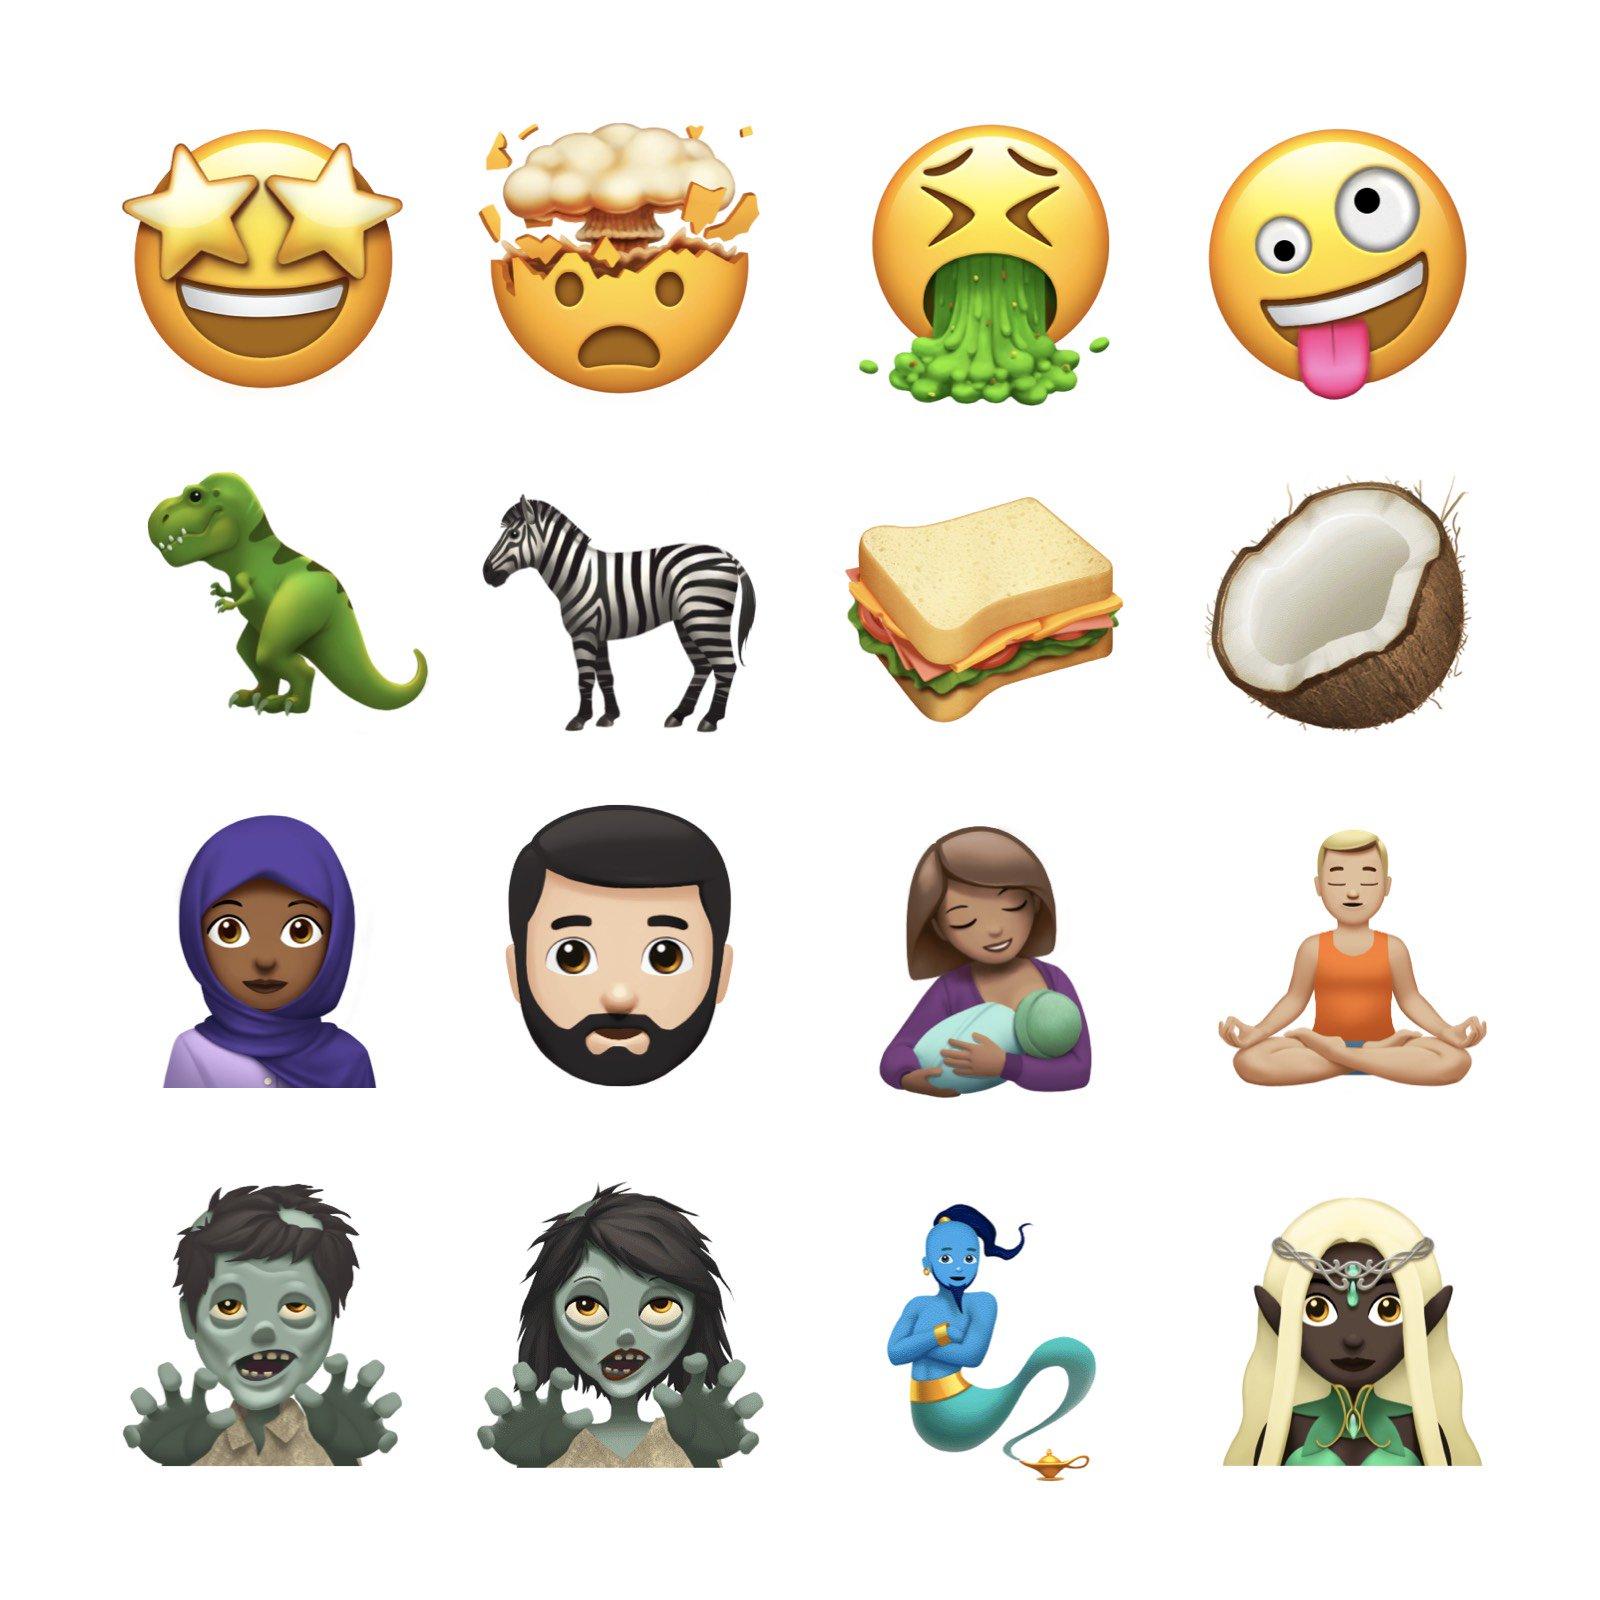 ios-new-emojis-2017-emojipedia-emoji-5